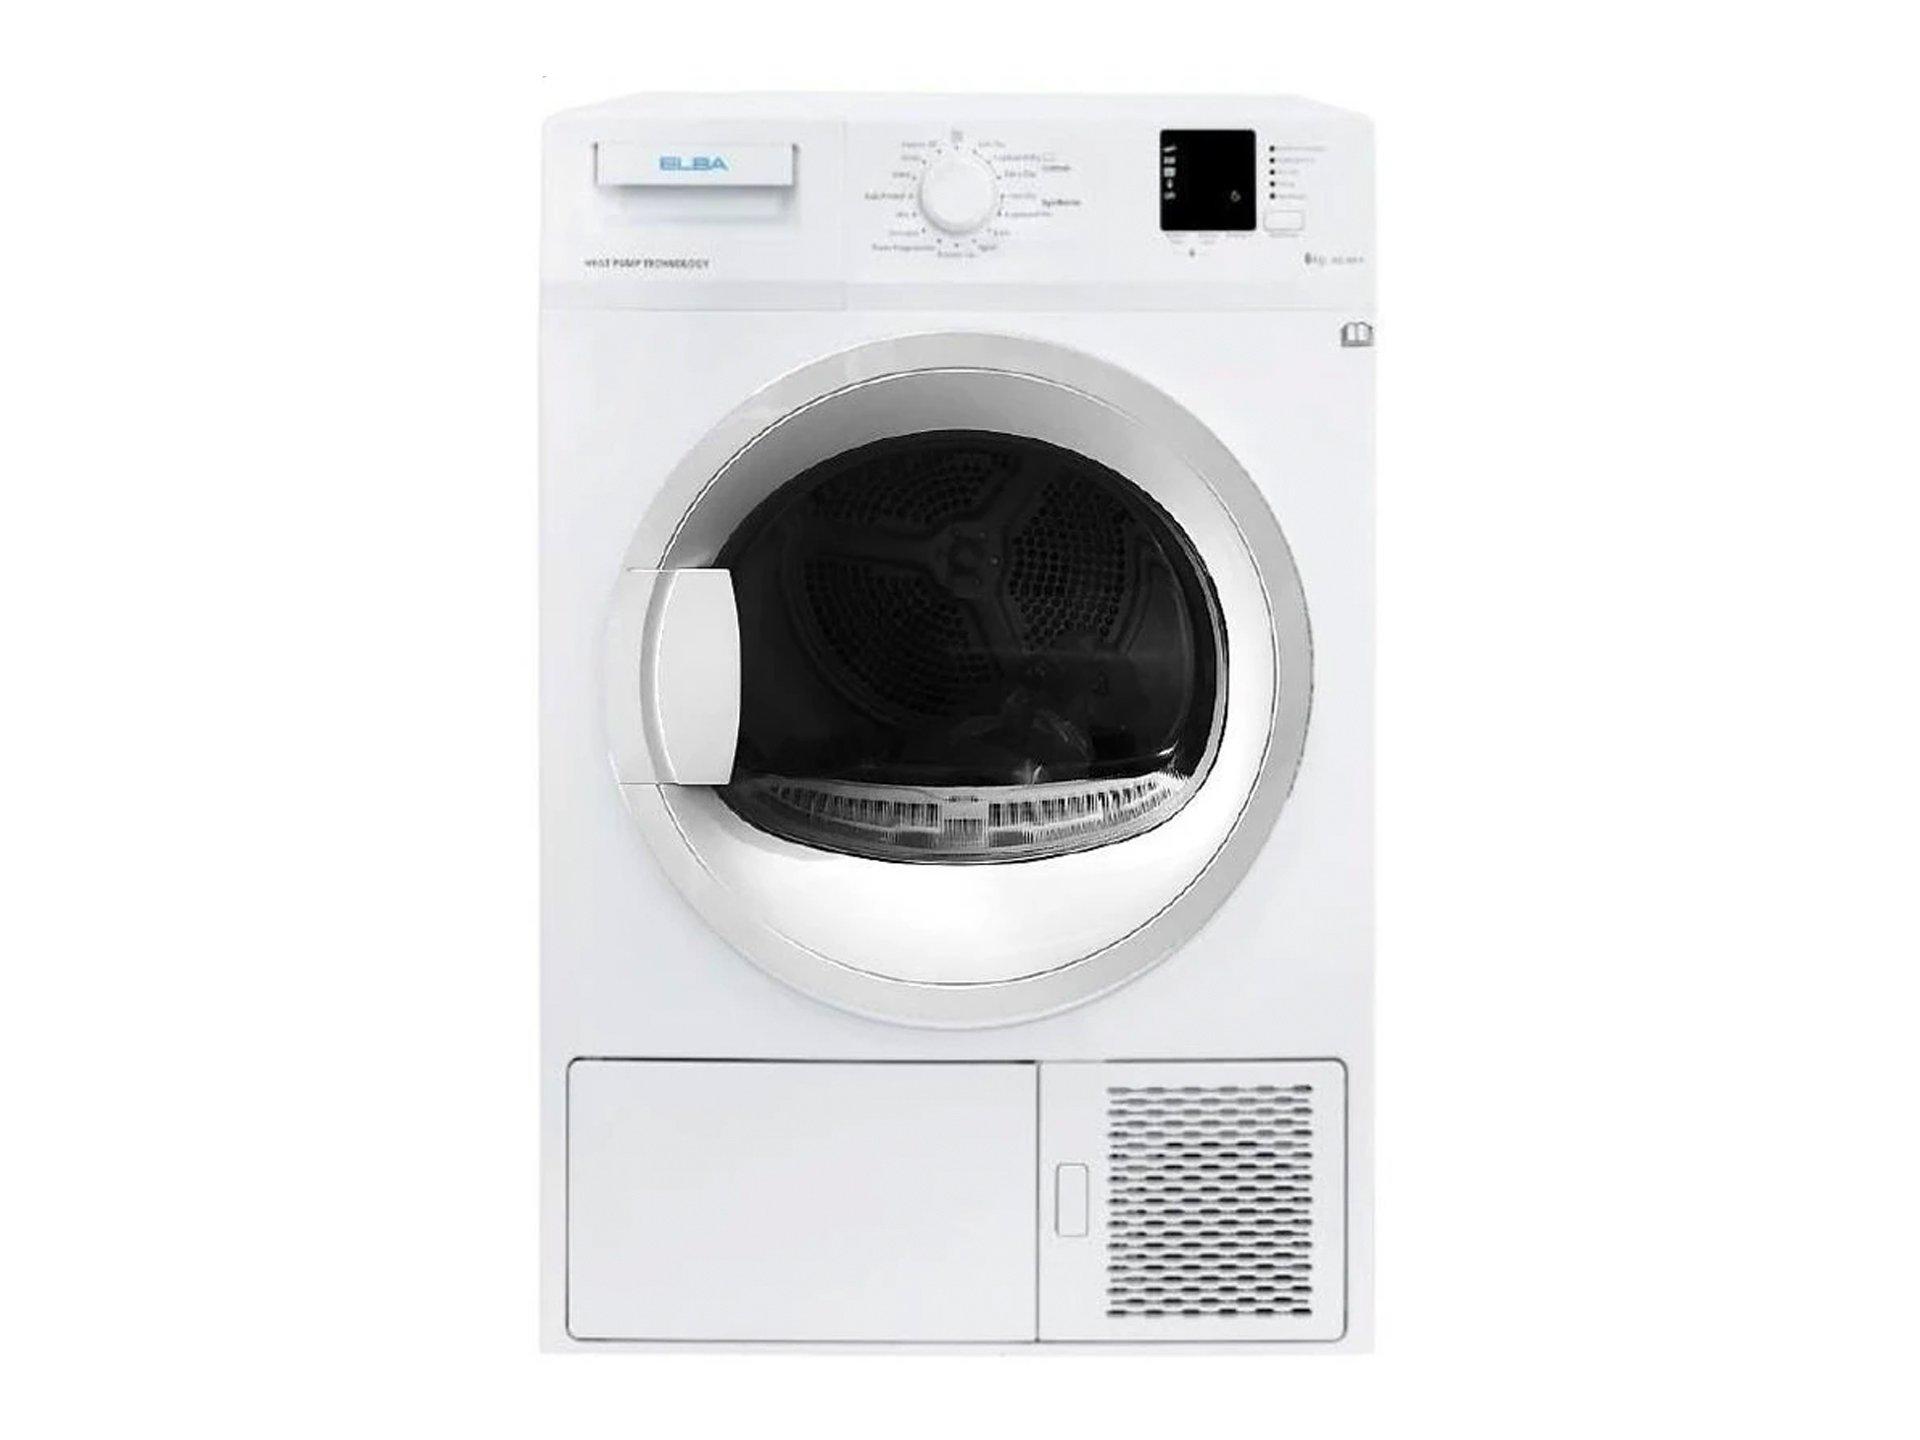 Yeobuild HomeStore Elba ELBA EBD 881 H 8.0KG Dryer